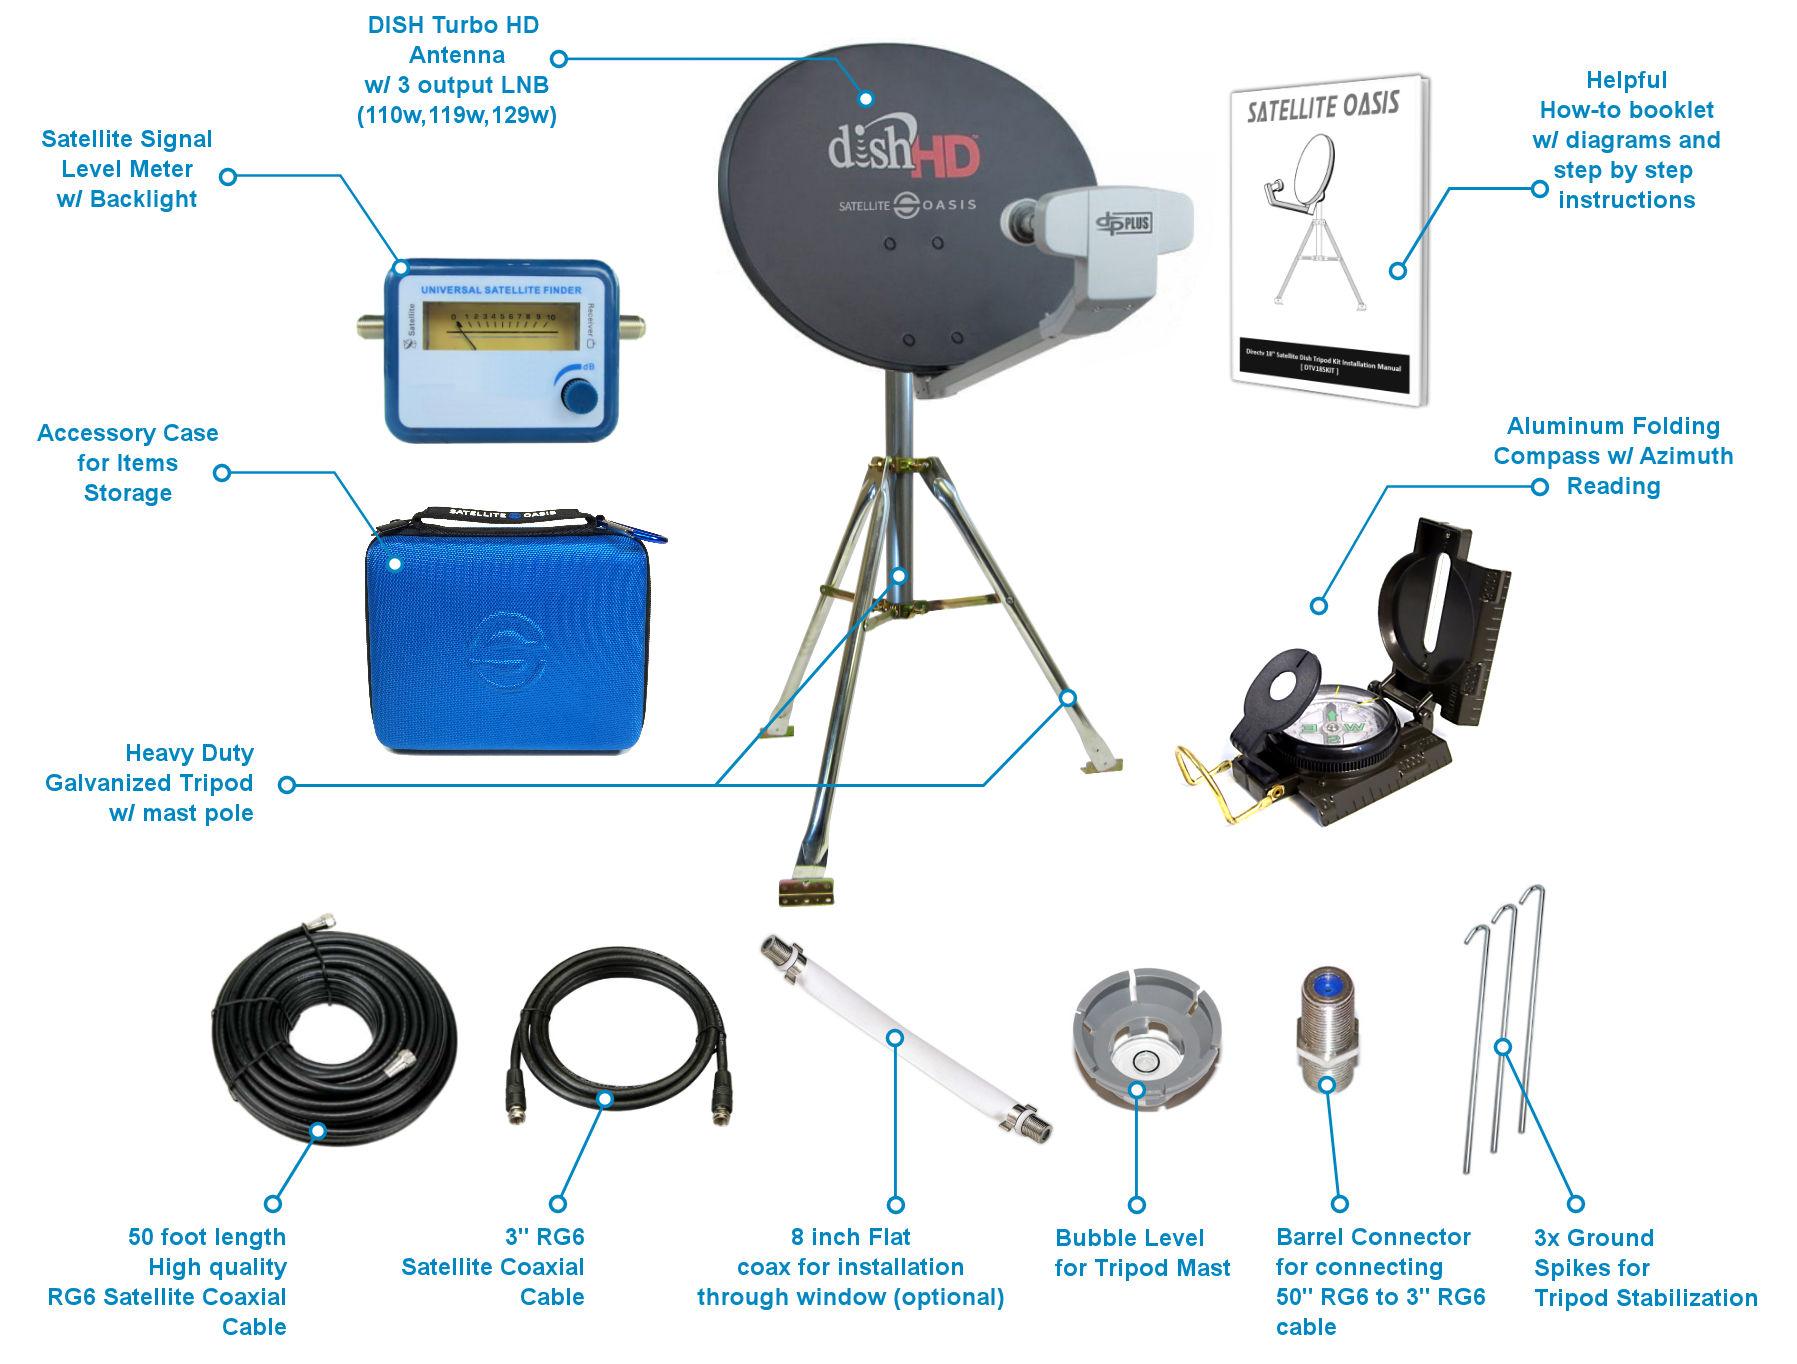 bell hd satellite wiring diagram kenmore oven dish network hdtv portable tripod kit for rv